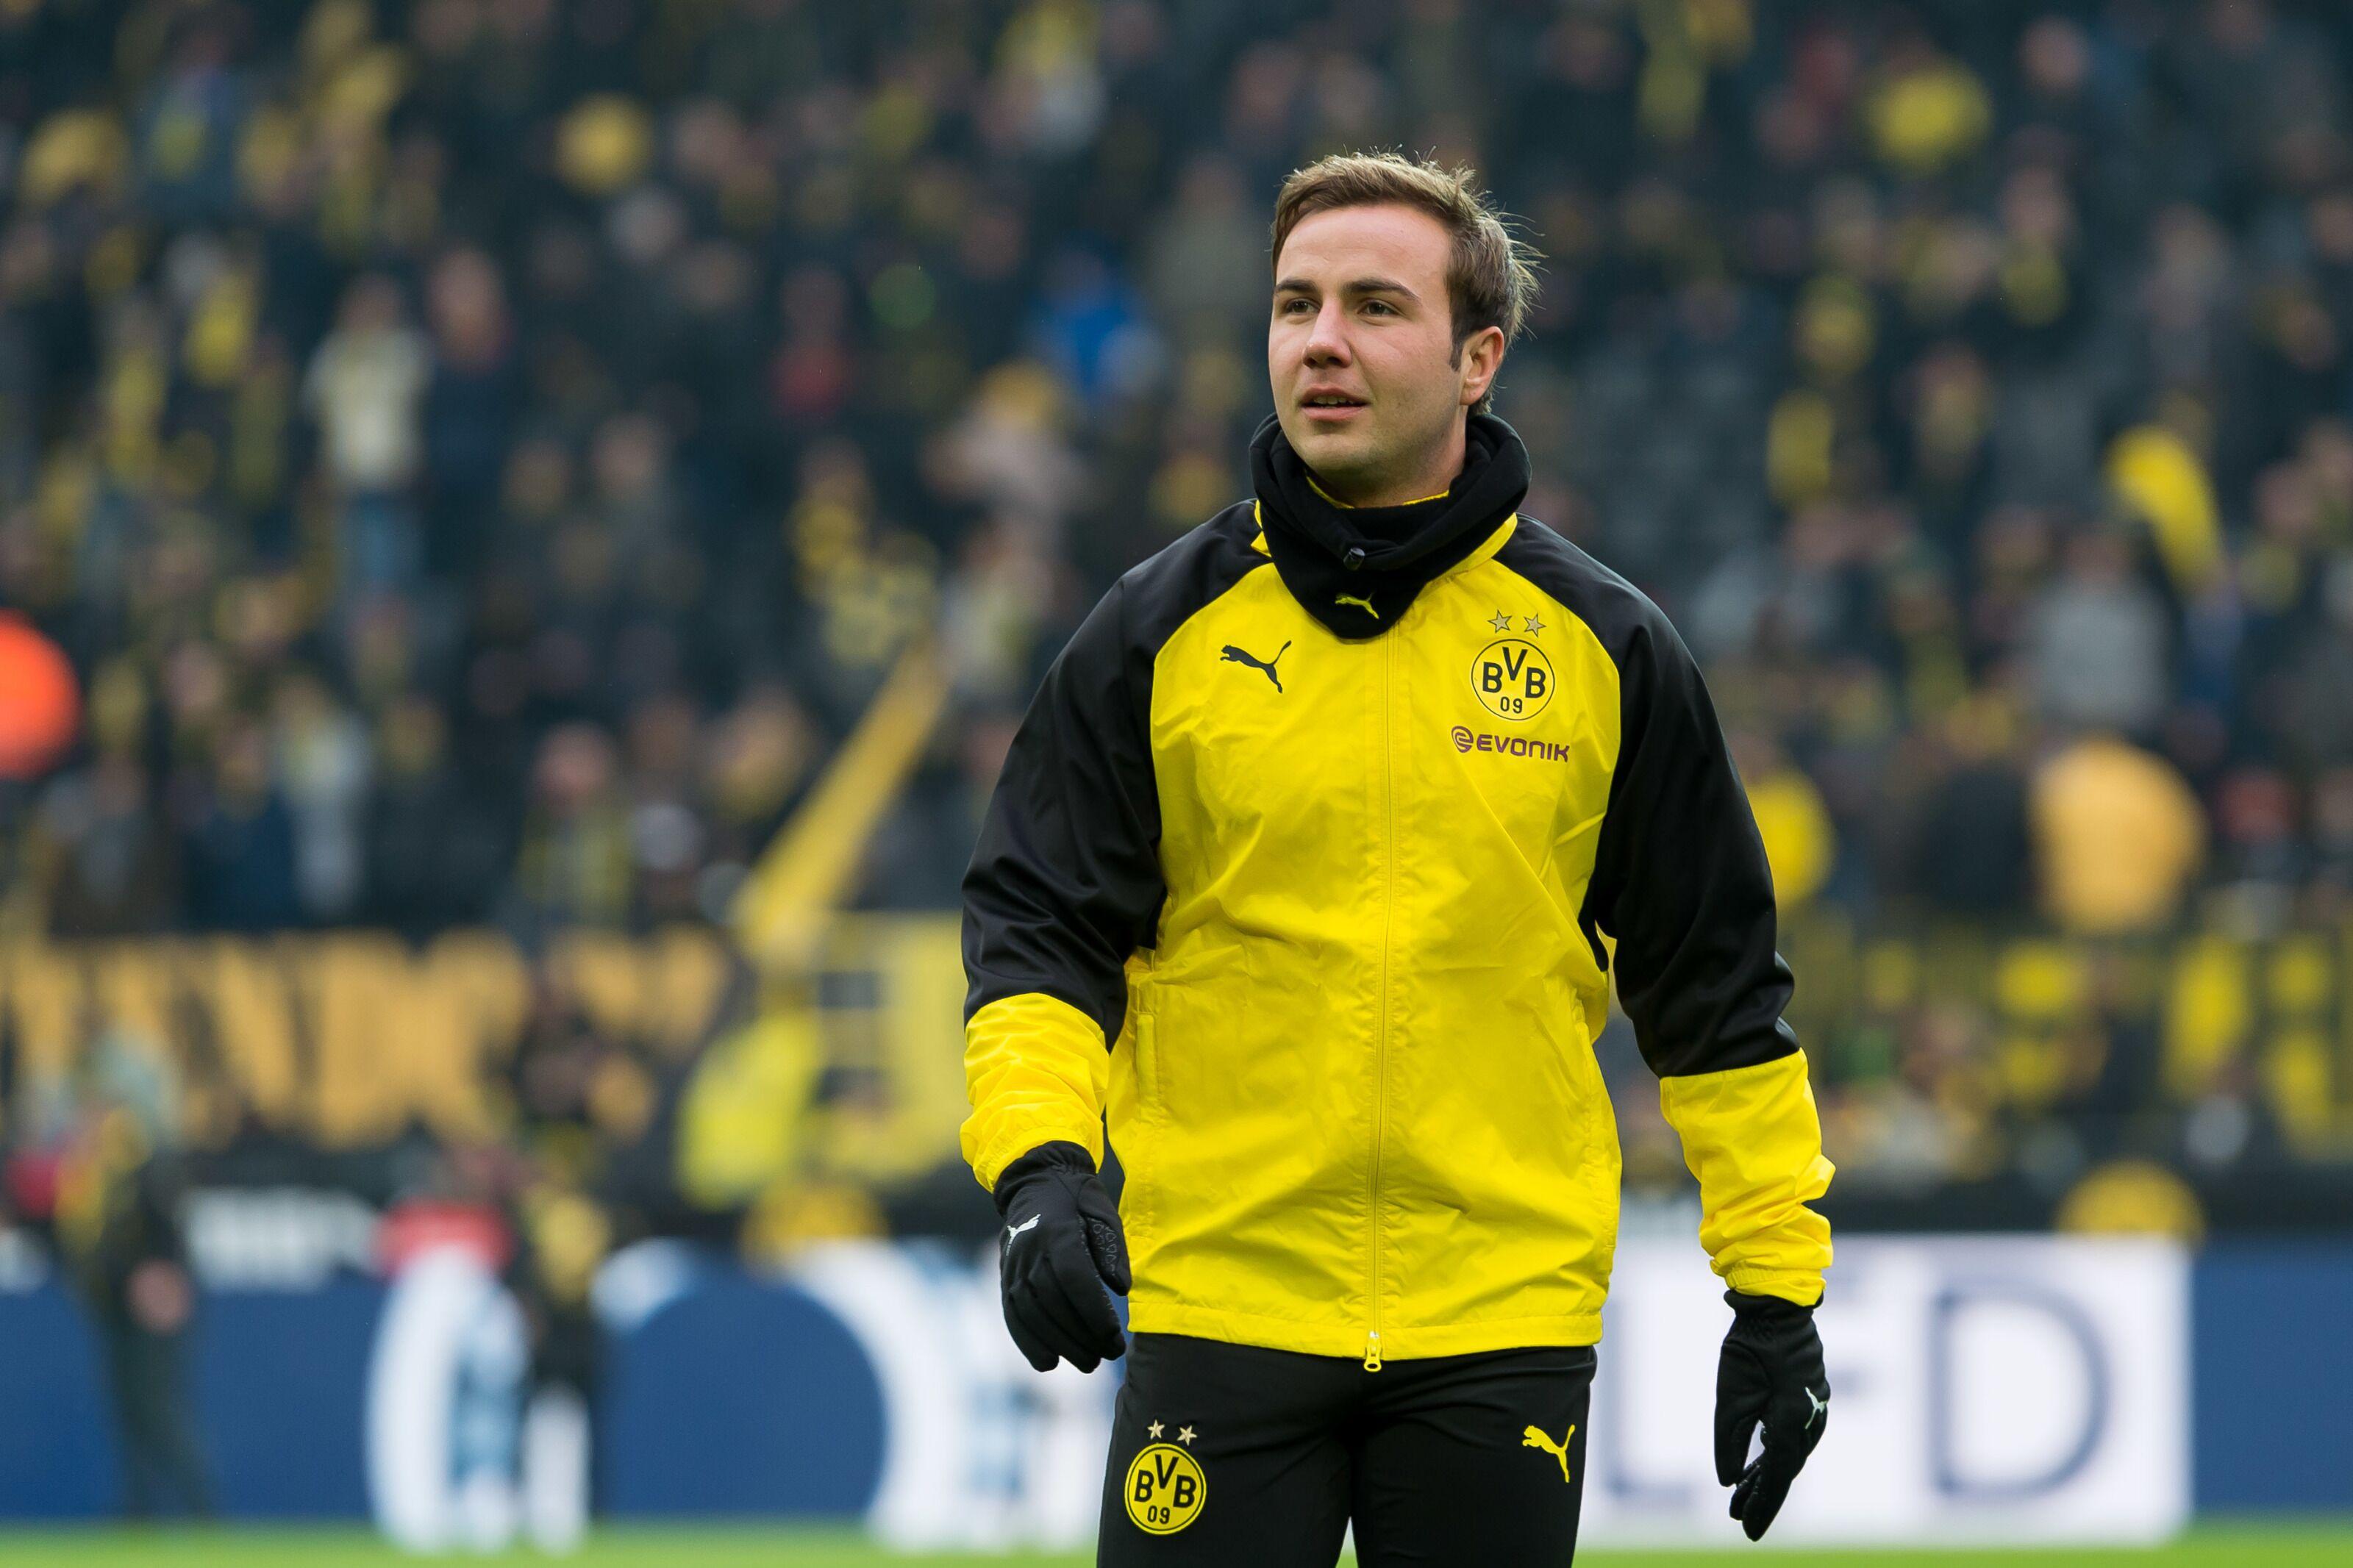 3c63de407a0 Rumor  Arsenal now want Borussia Dortmund playmaker Mario Götze